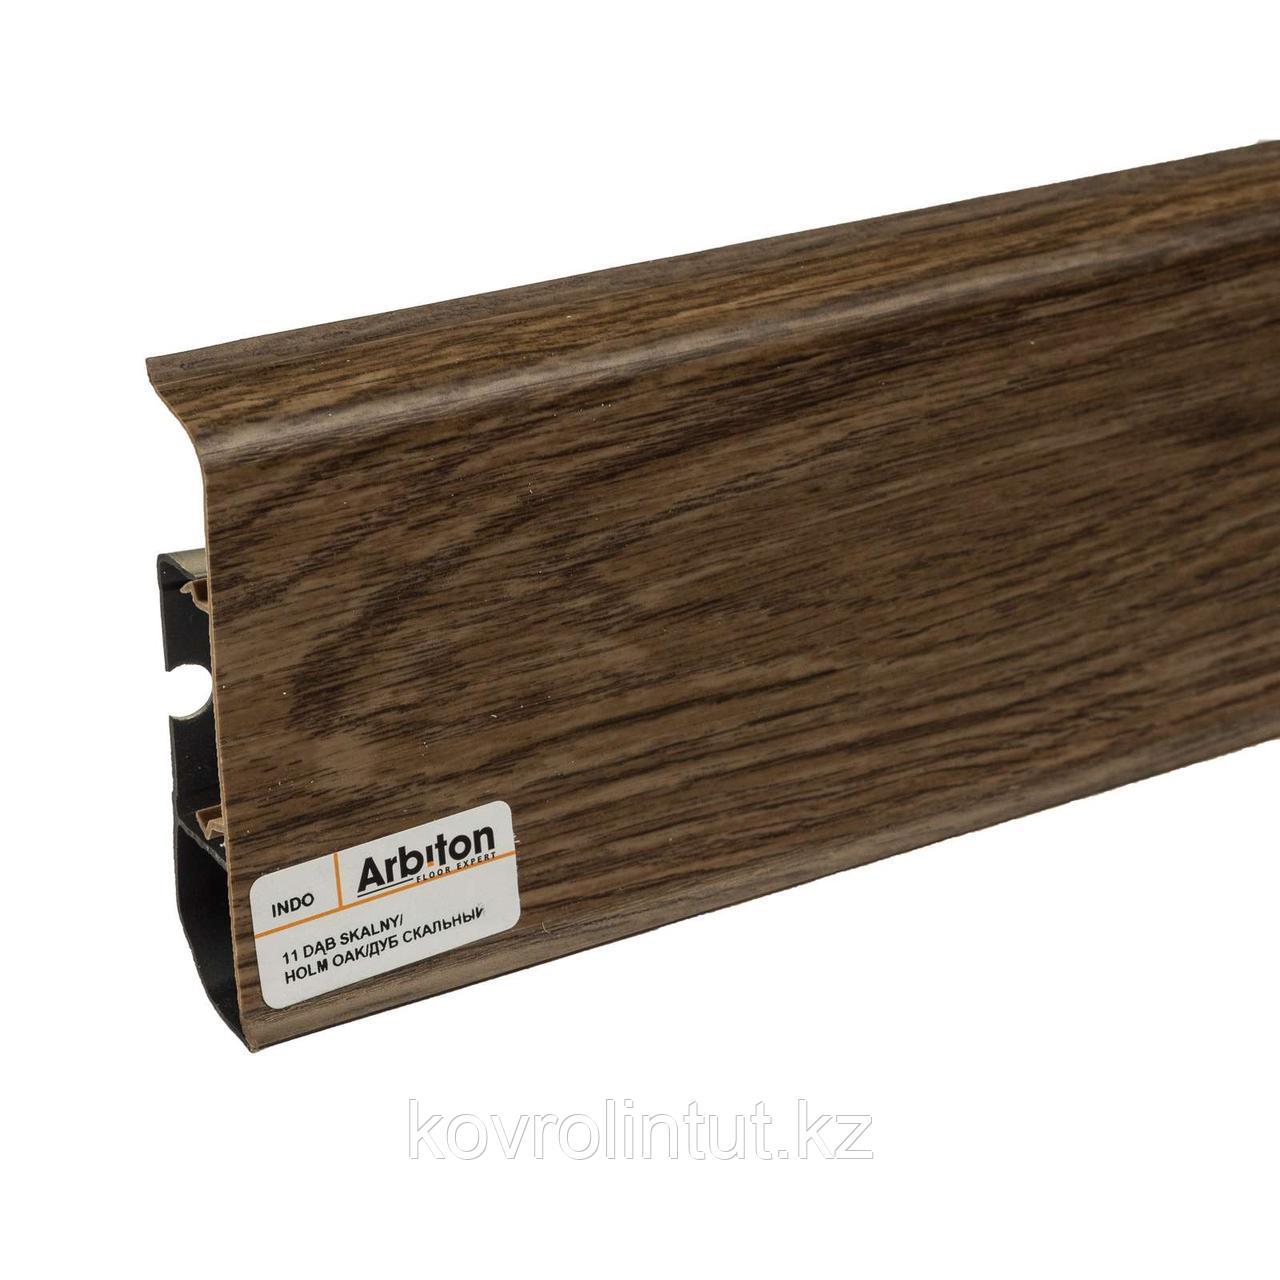 Плинтус Arbiton Indo 11, Дуб Скальный, 2500х70х26 мм